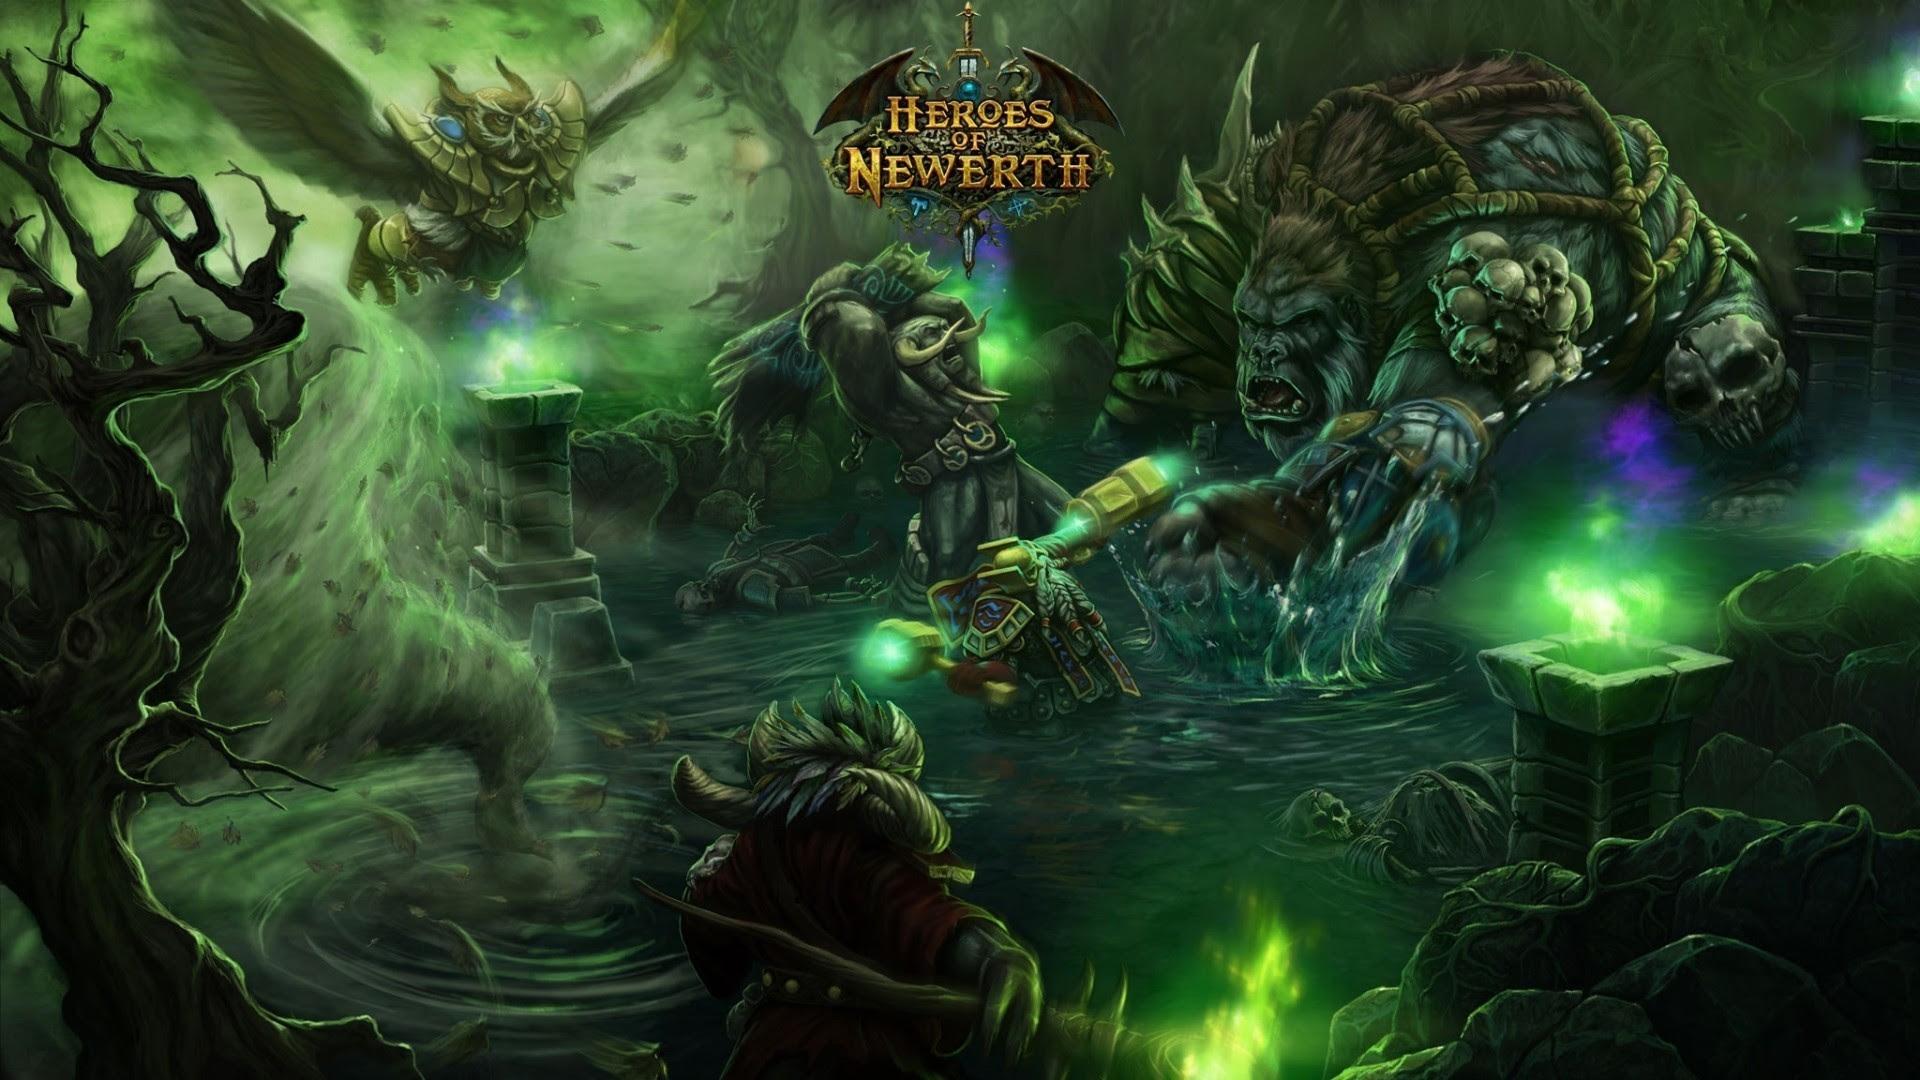 Undead Warlock Wallpaper 71 Images